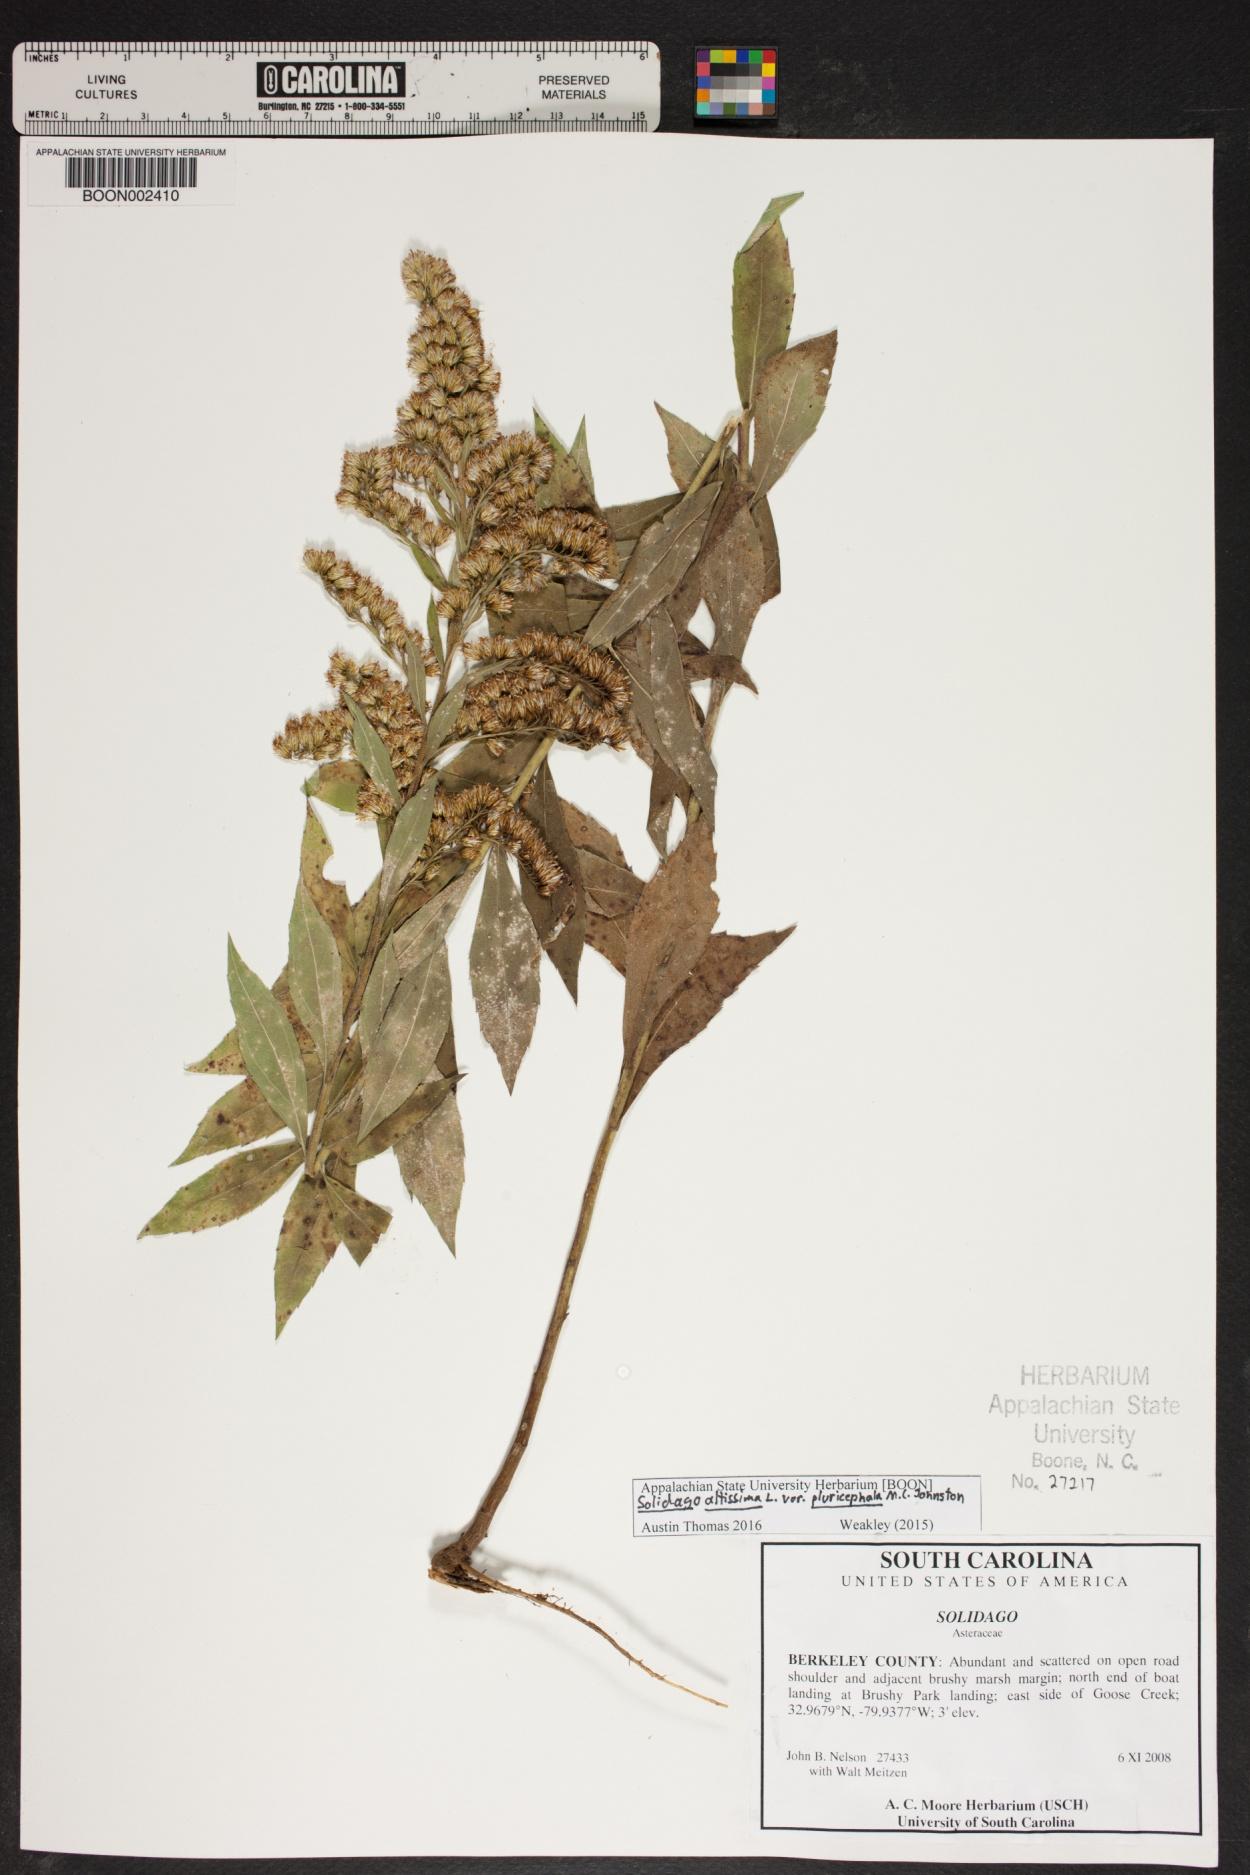 Solidago altissima var. pluricephala image